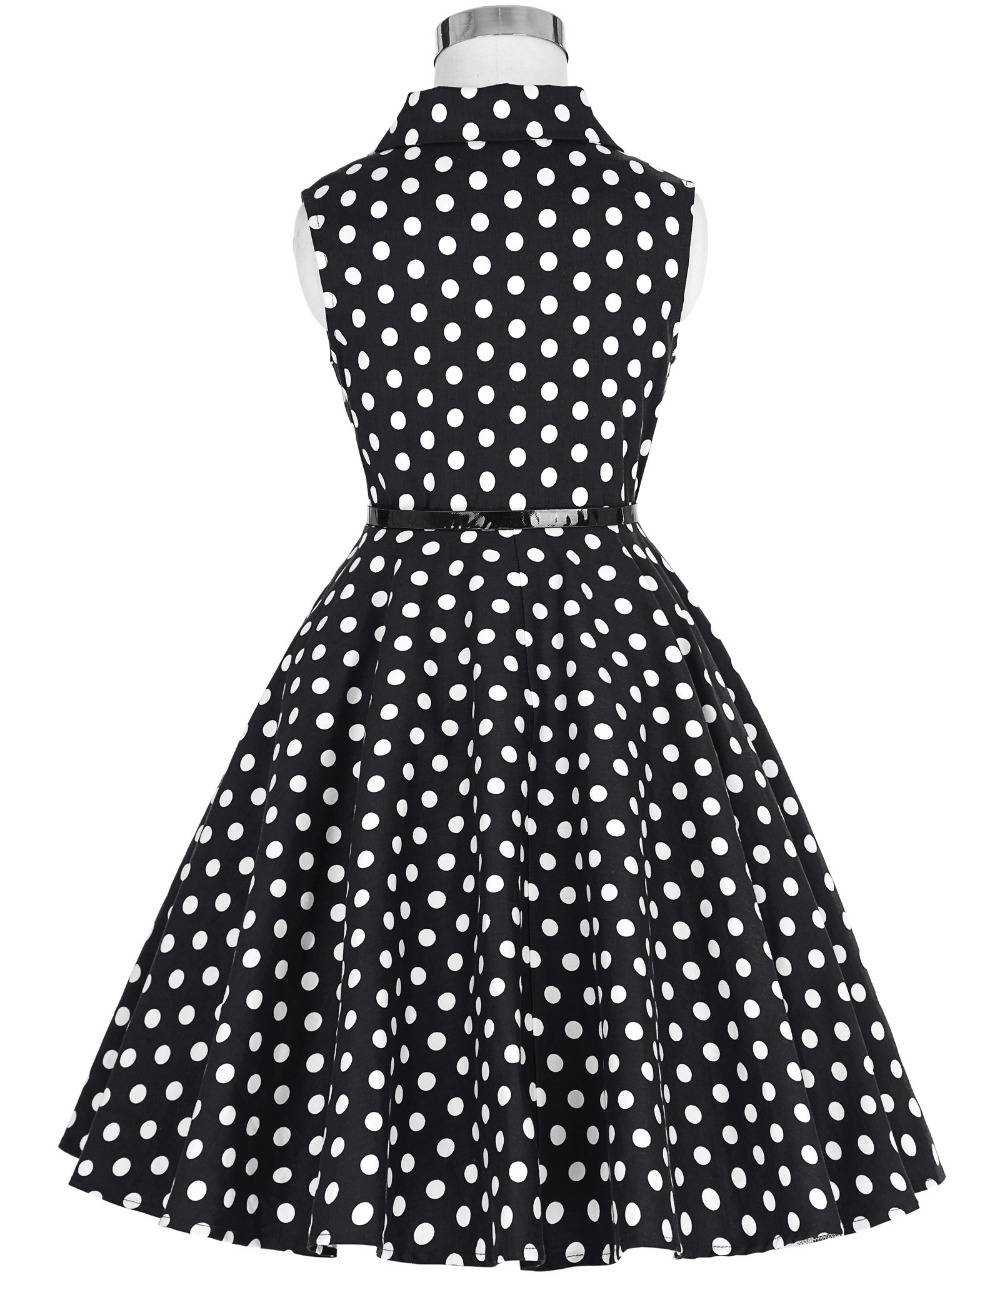 Grace Karin Flower Girl Dresses for Weddings 2017 Sleeveless Polka Dots Printed Vintage Pin Up Style Children's Clothing 8